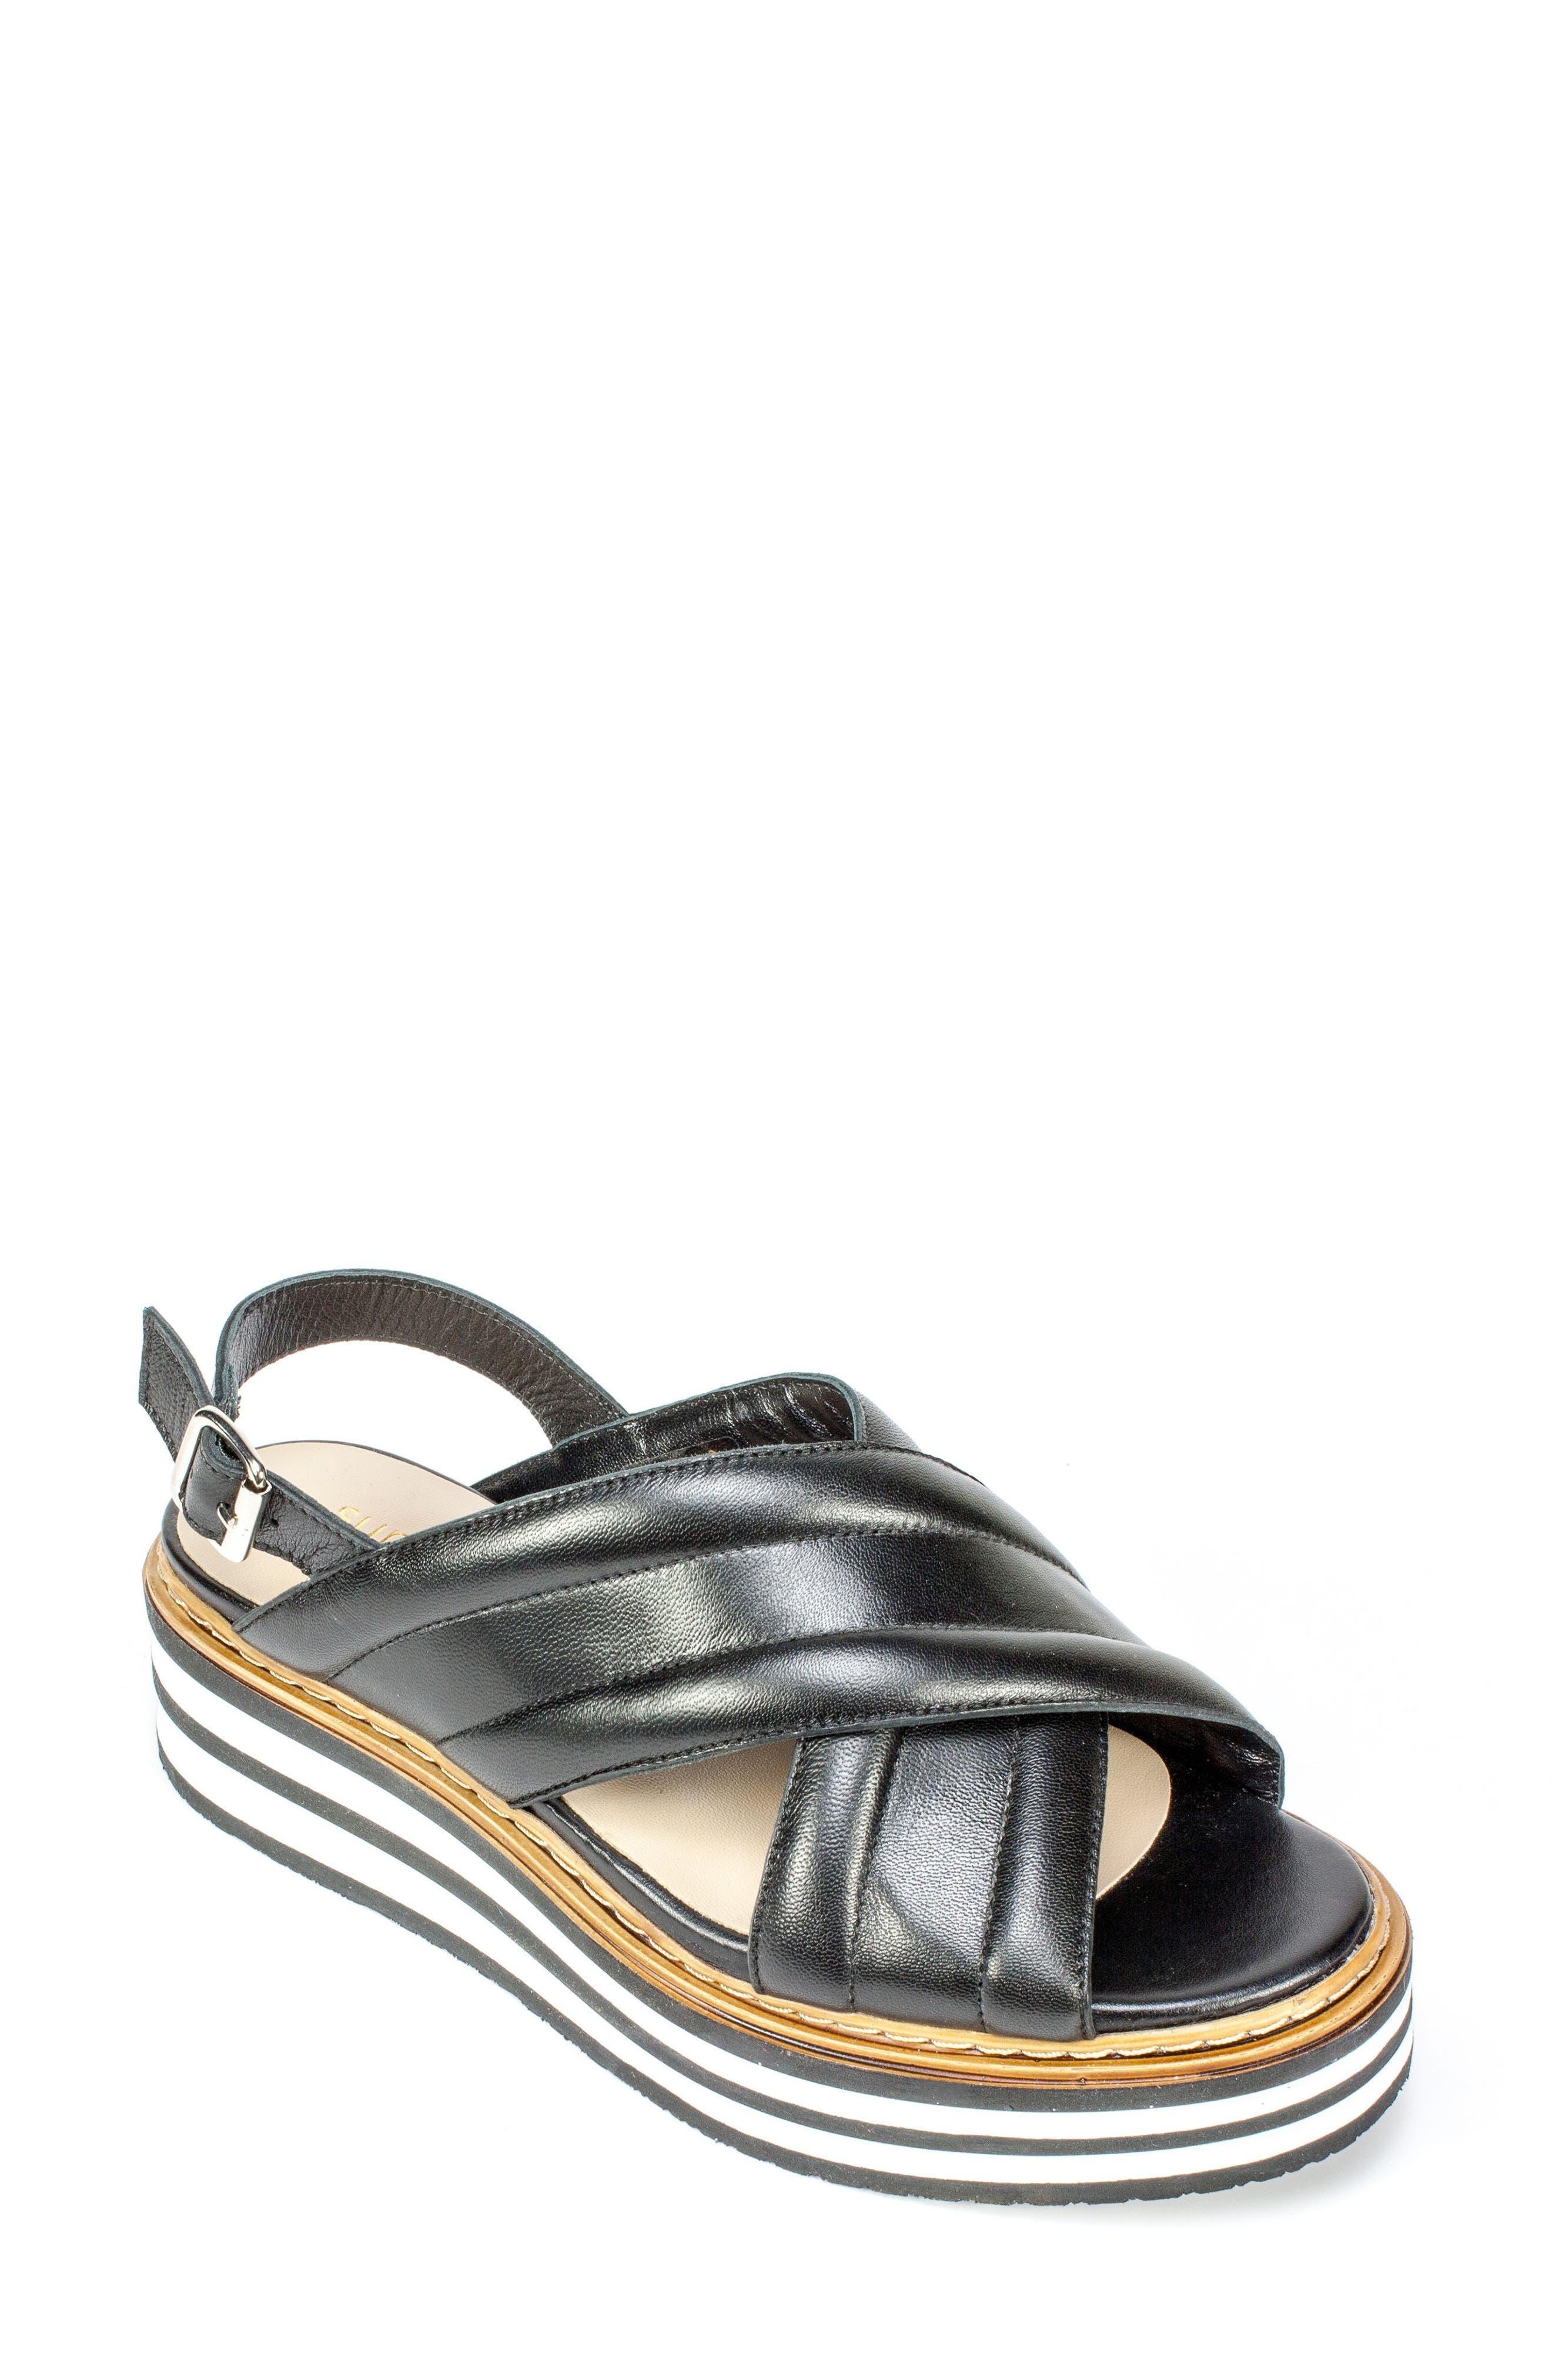 Leanna Platform Sandal,                             Main thumbnail 1, color,                             Black Leather